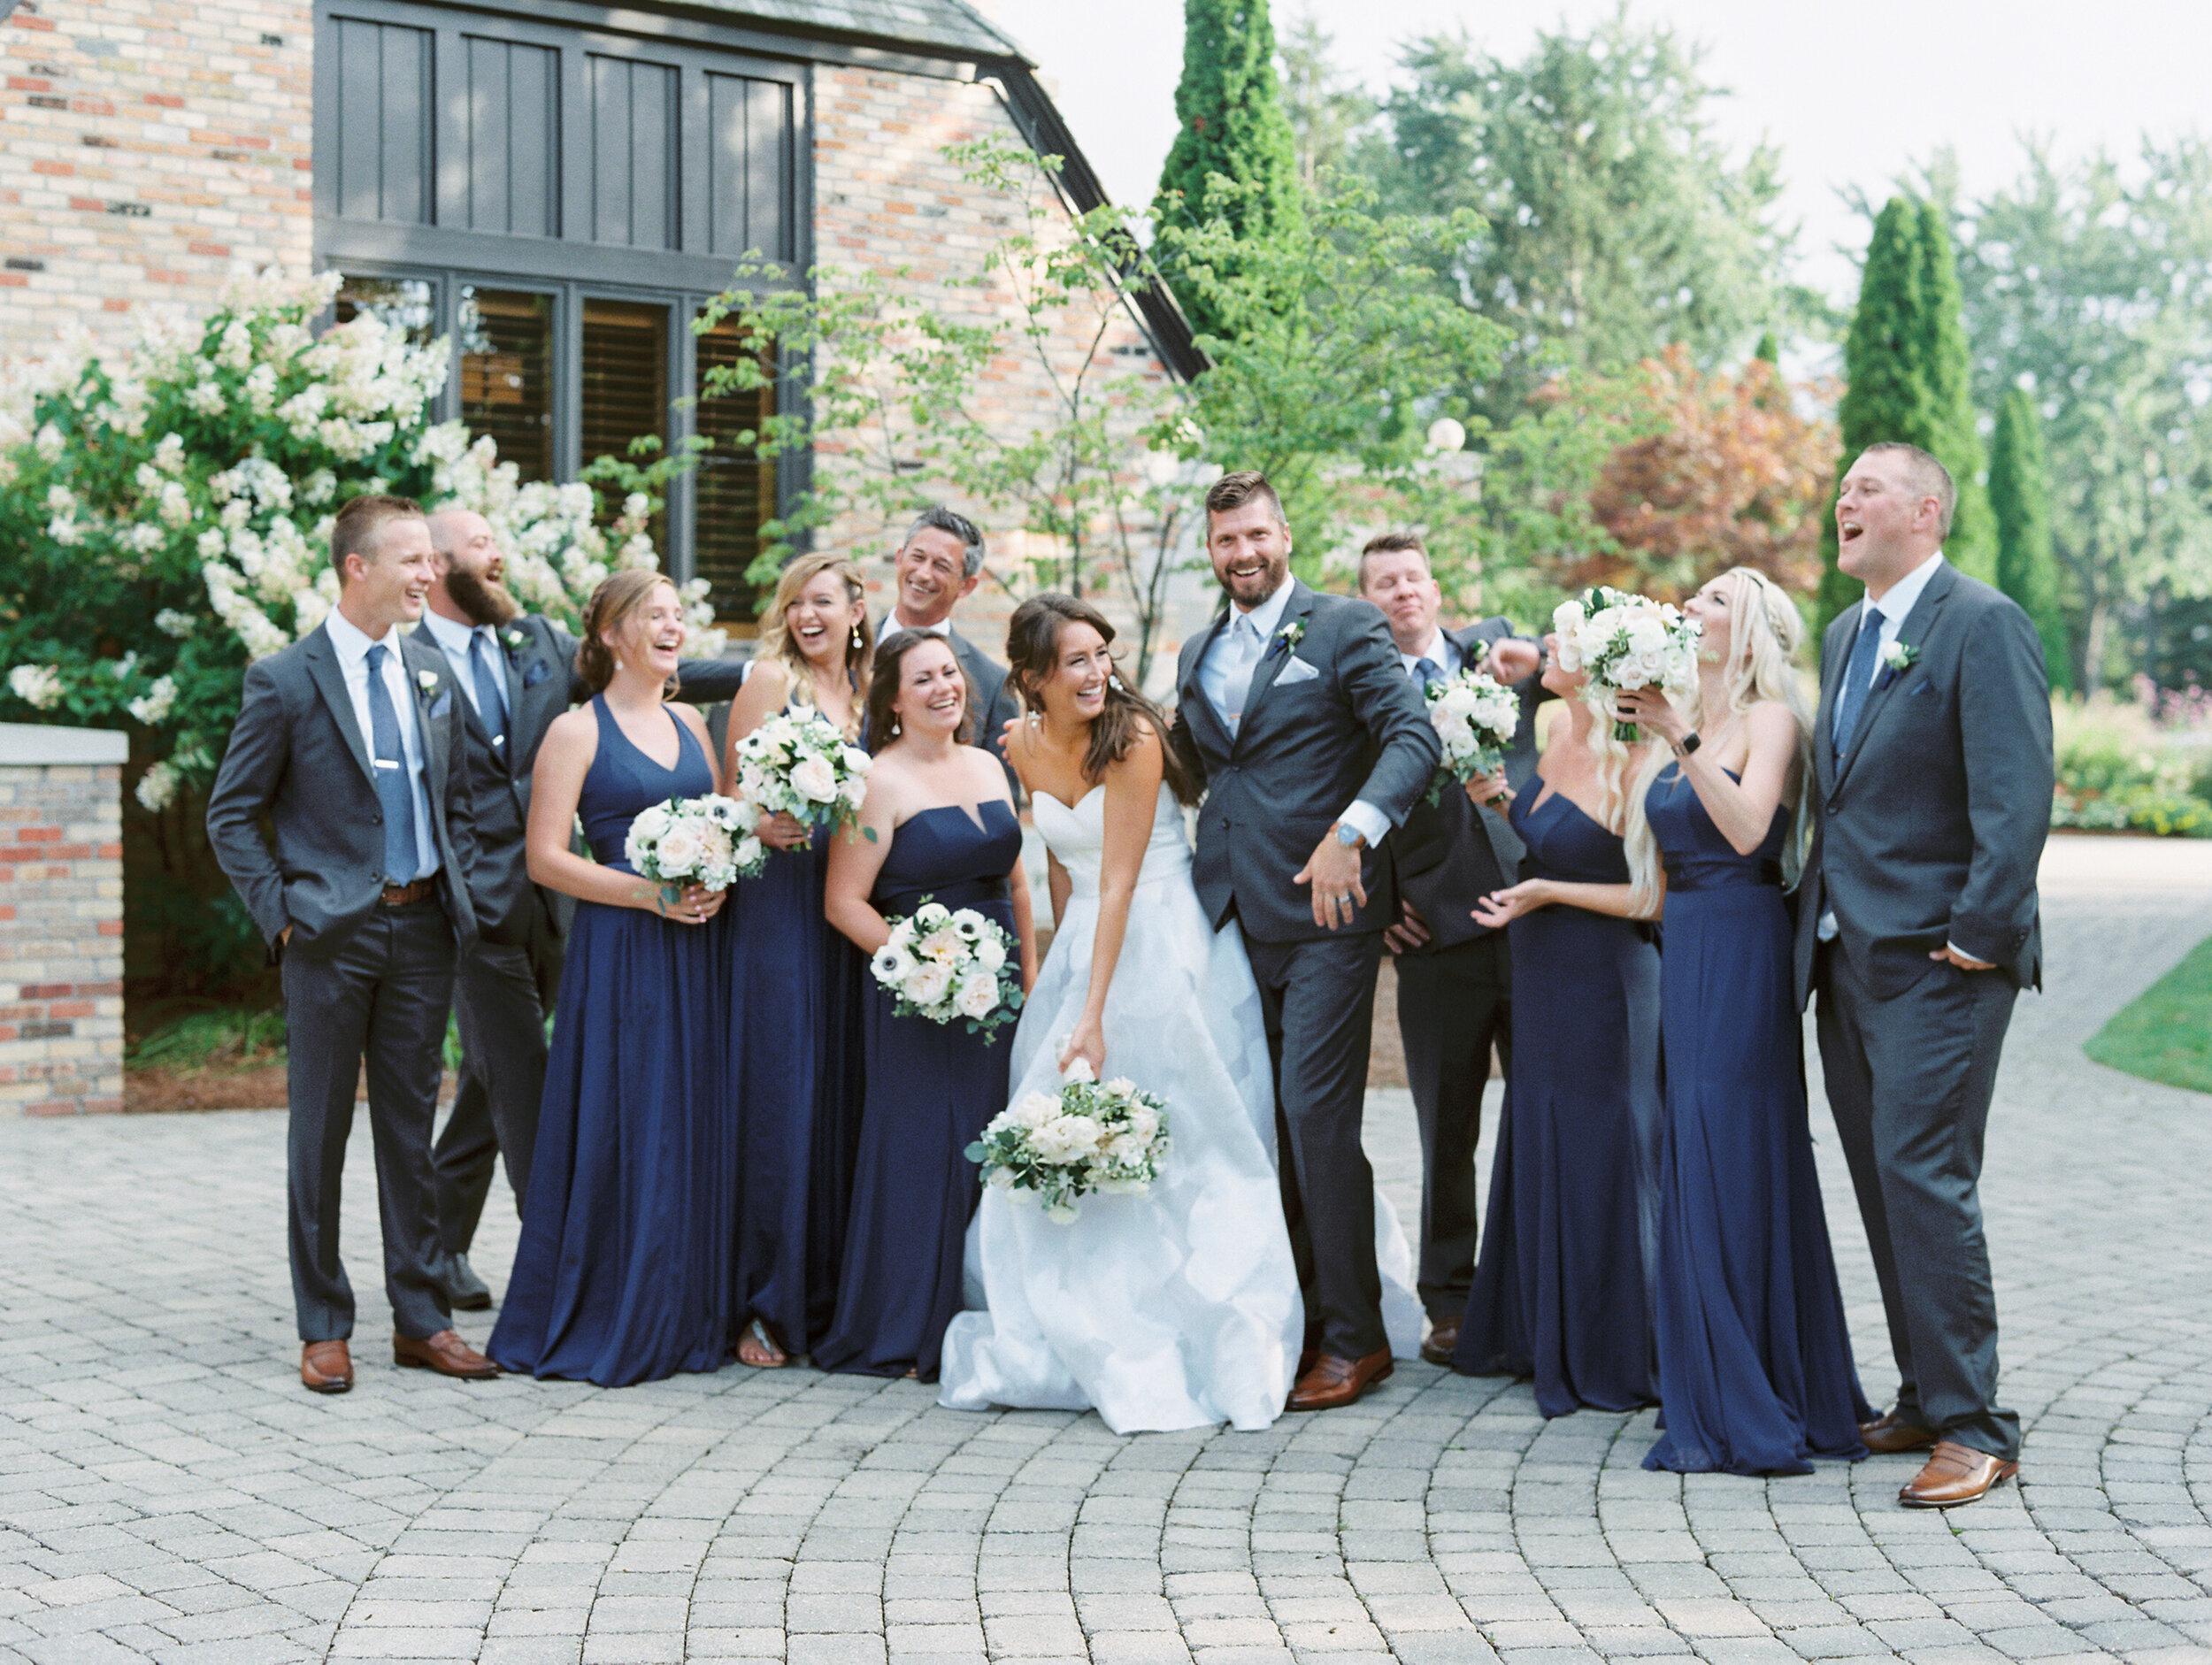 Kuiper+Wedding+Reception+Bridal+Party-115.jpg